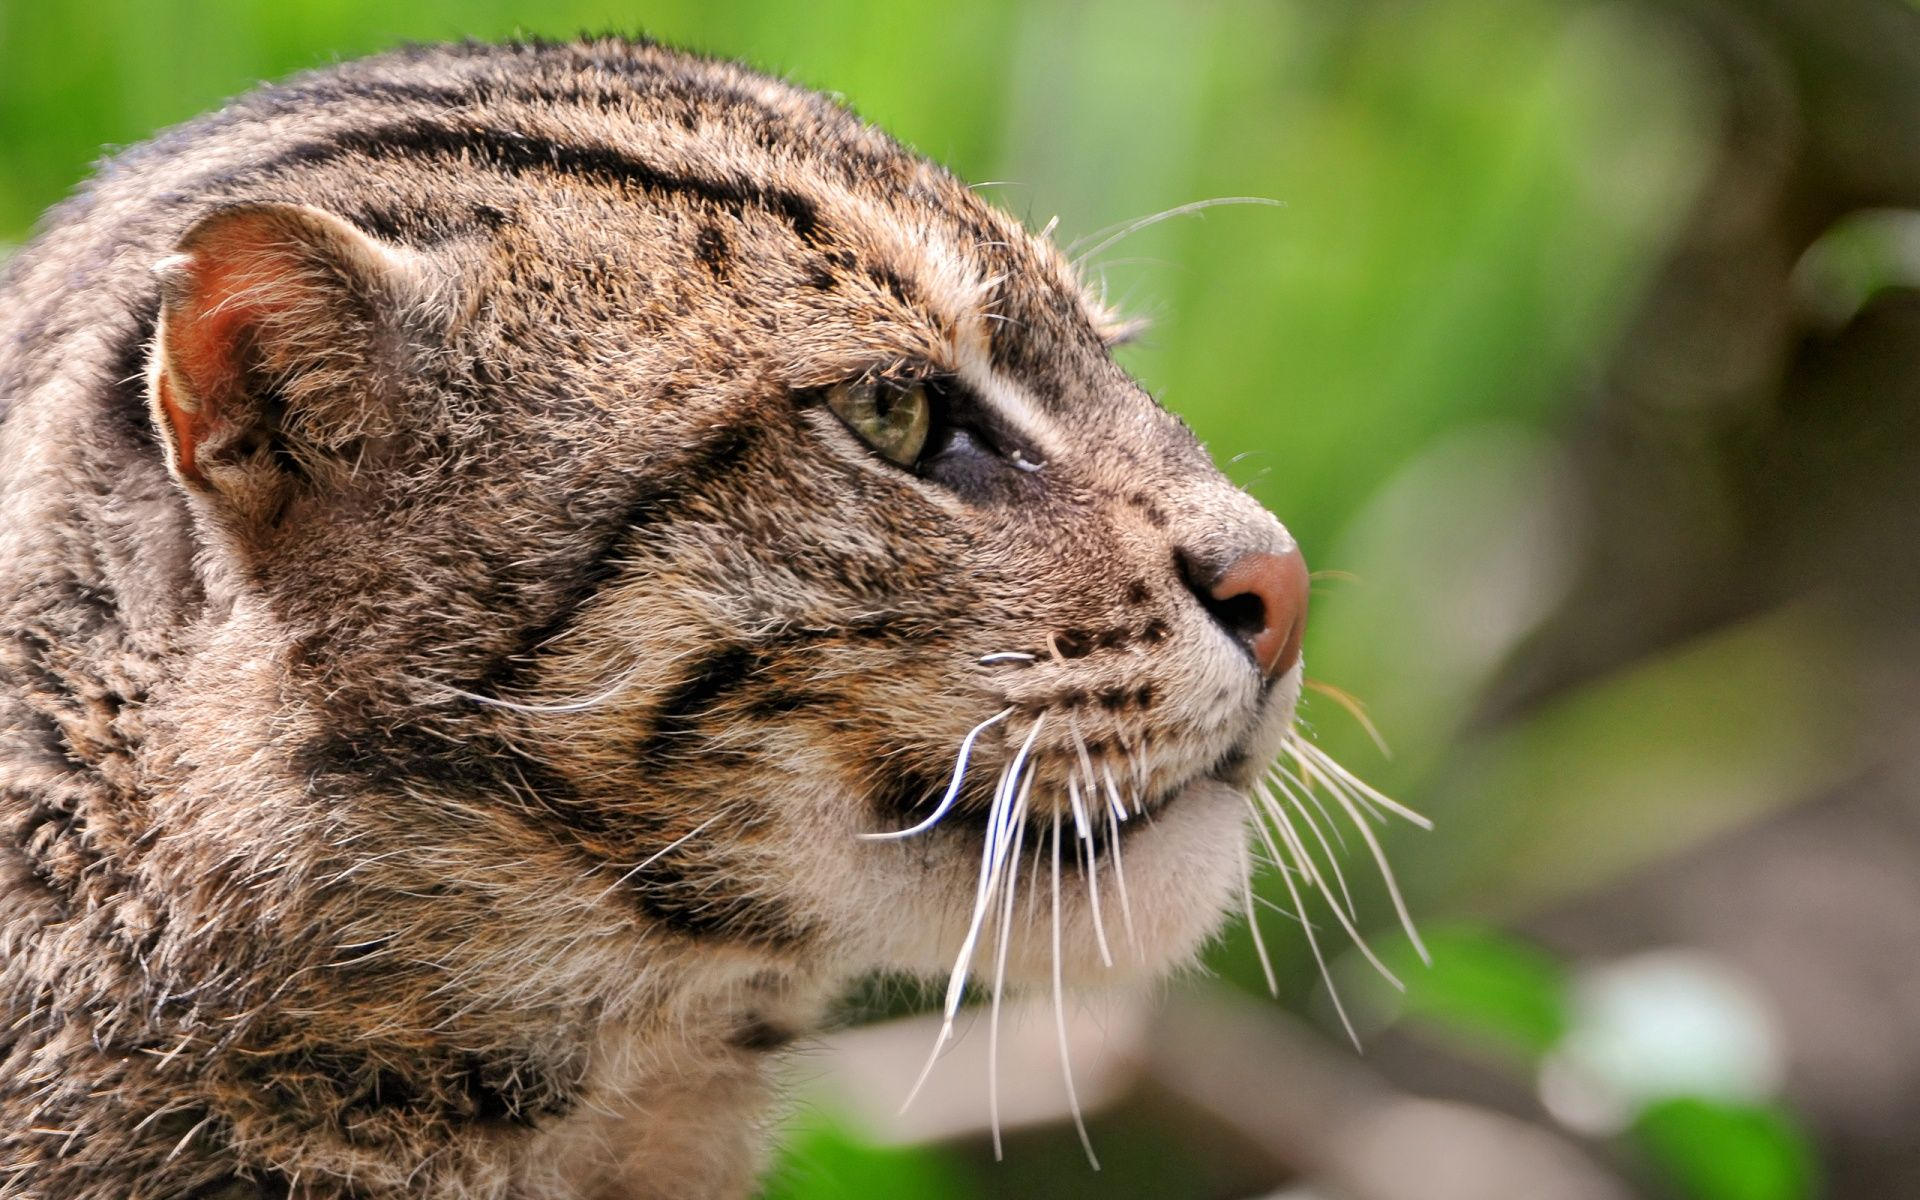 wild_cat_close_up Wild cat species, Small wild cats